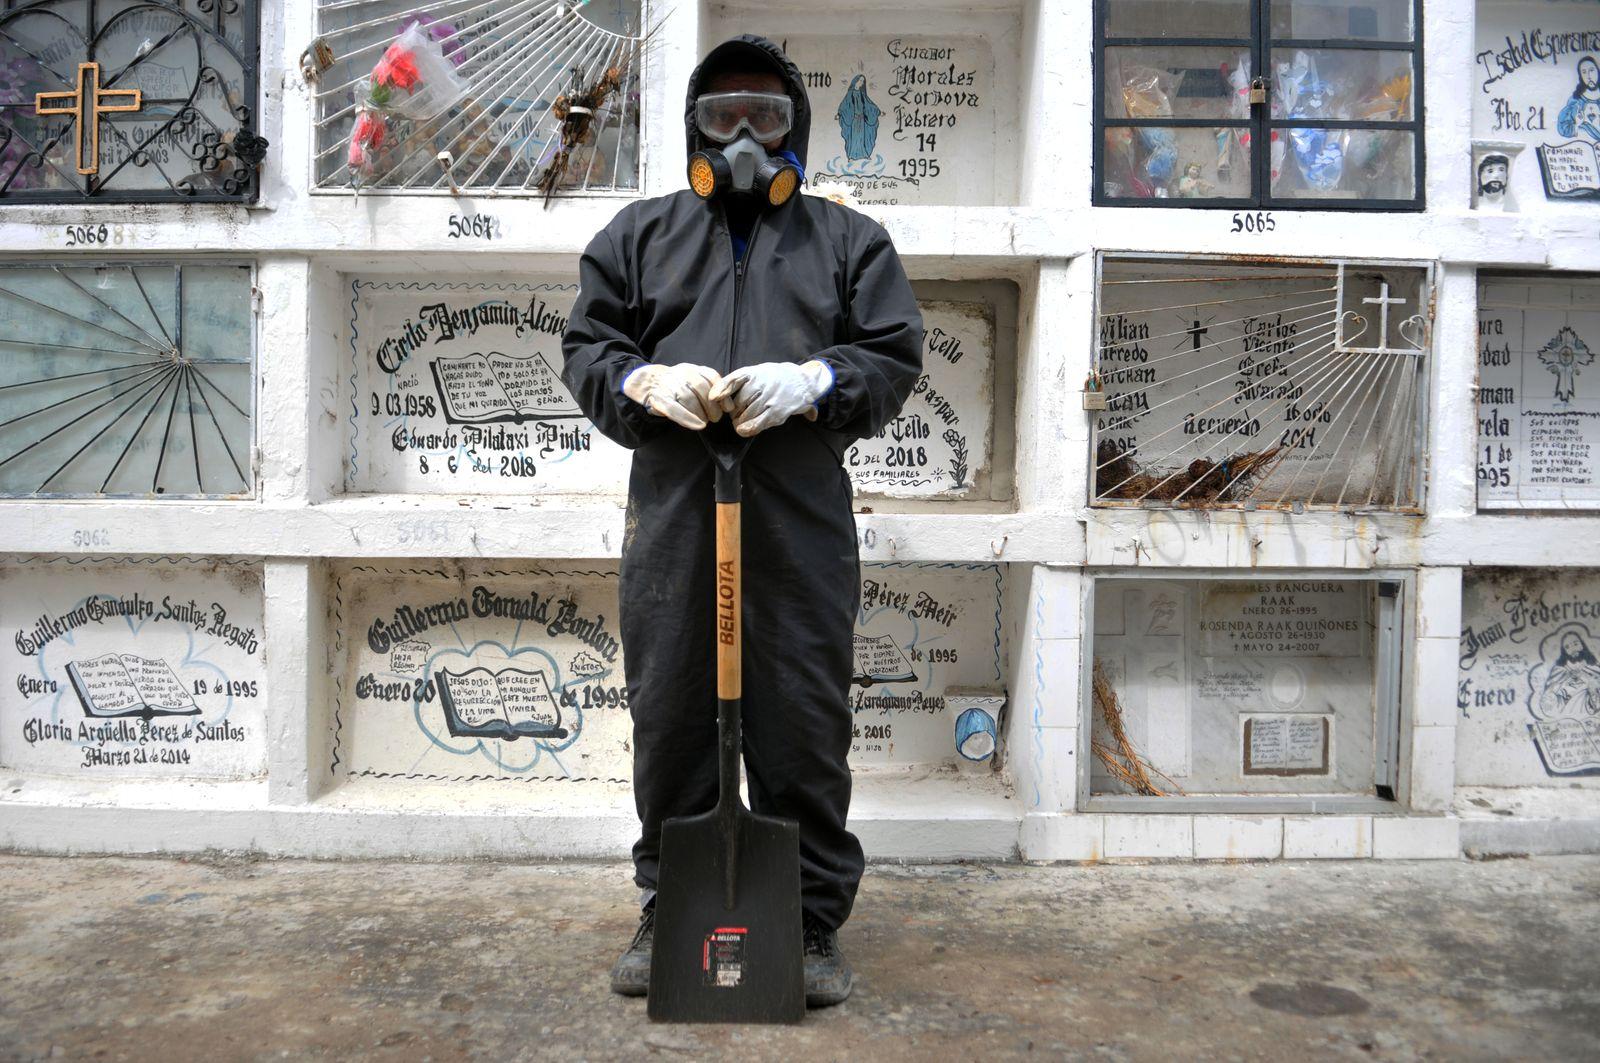 ECUADOR-HEALTH-VIRUS-MAYDAY-PHOTO ESSAY